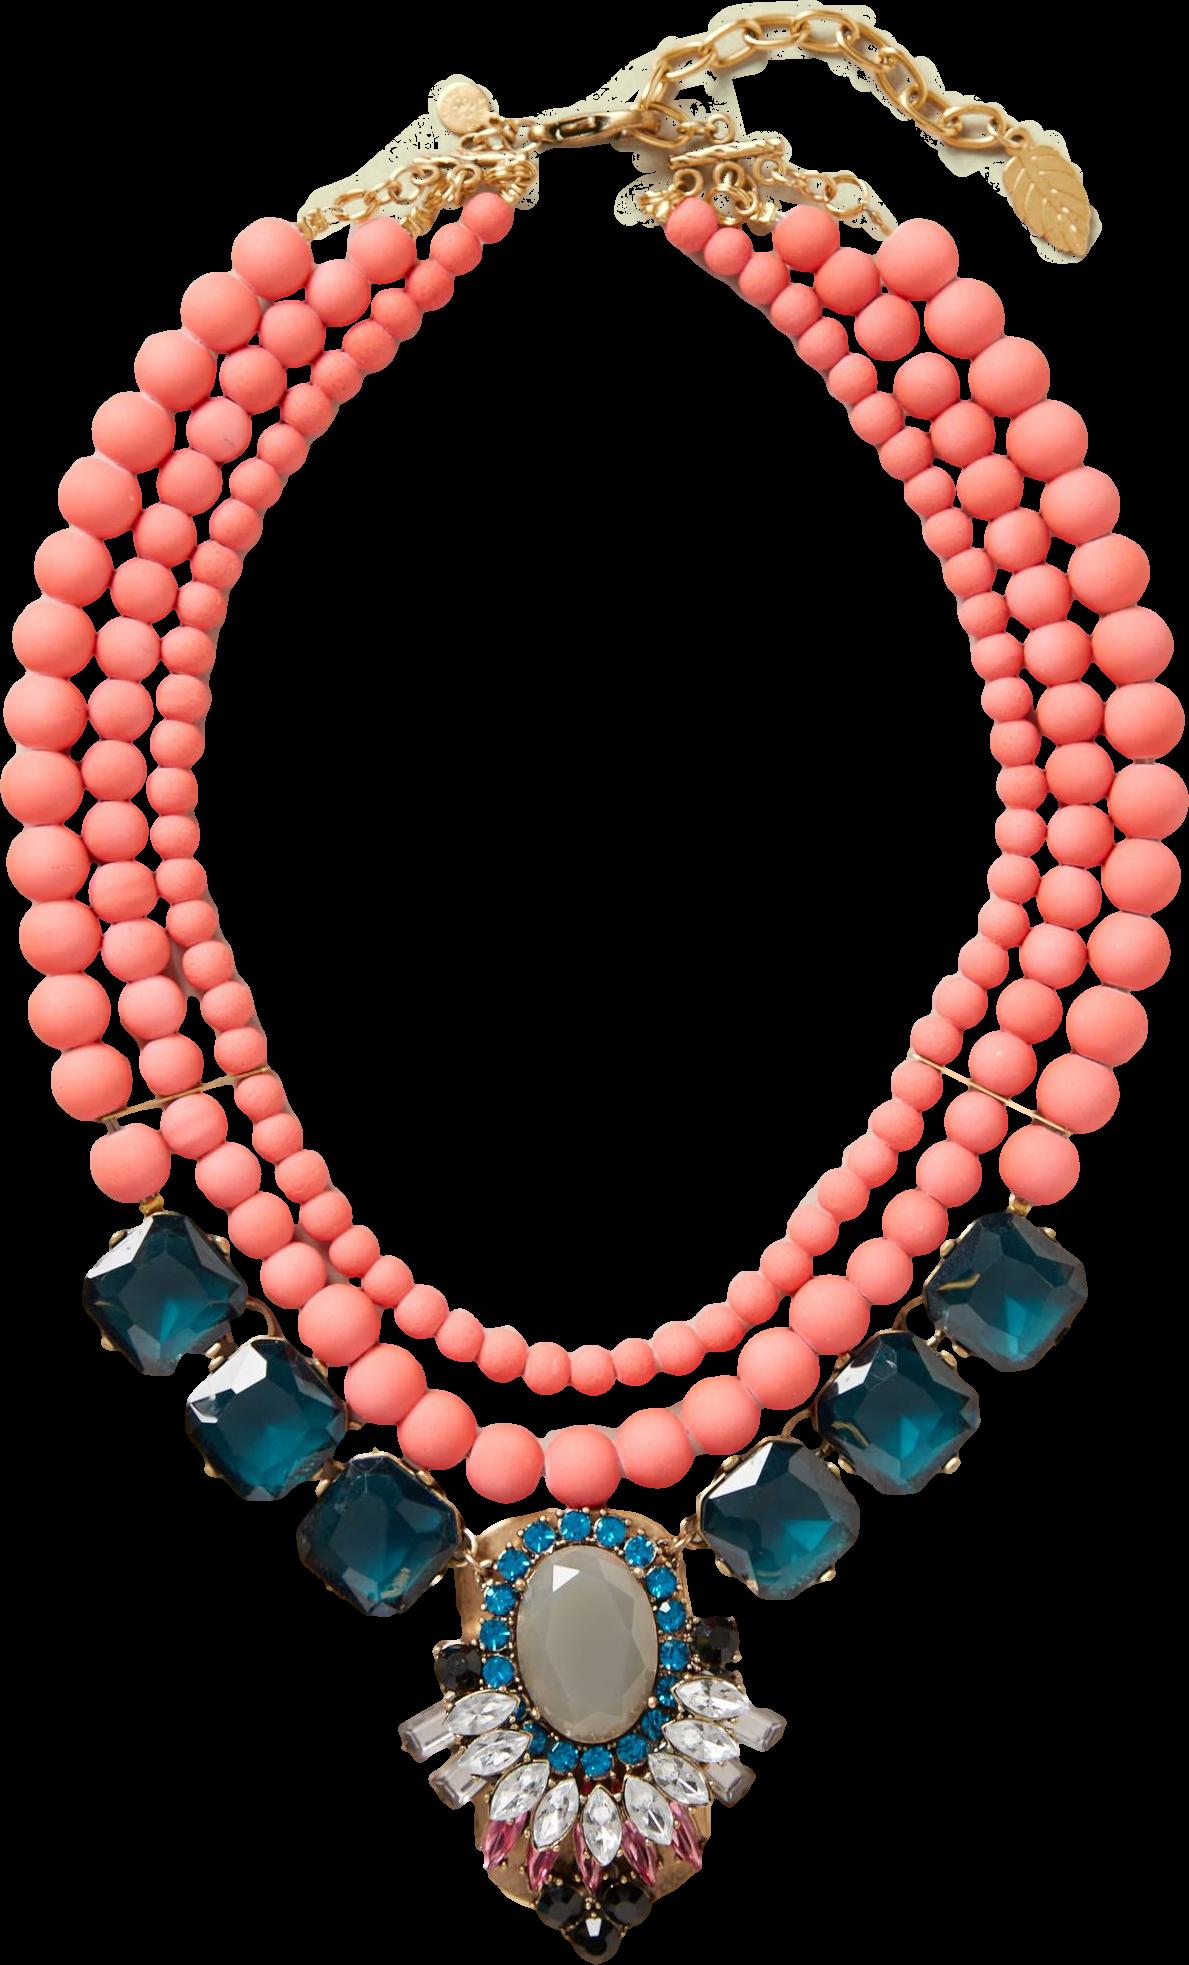 Gallica Bib Necklace